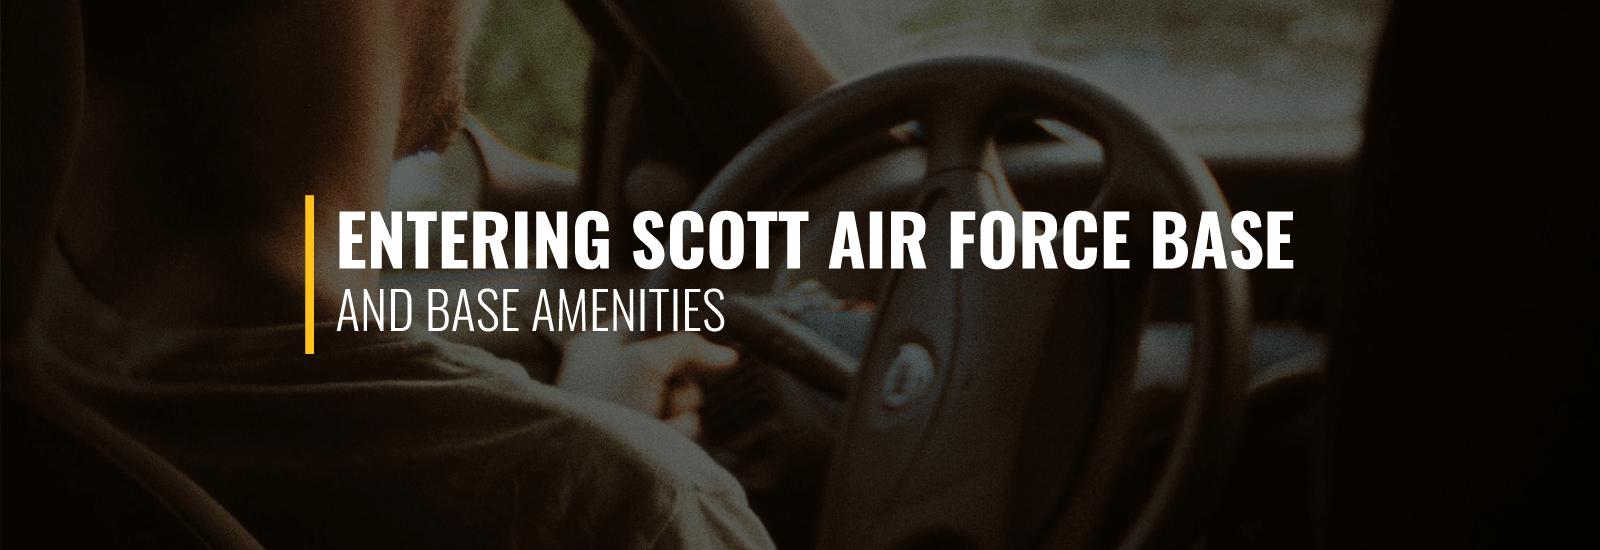 Entering Scott AFB